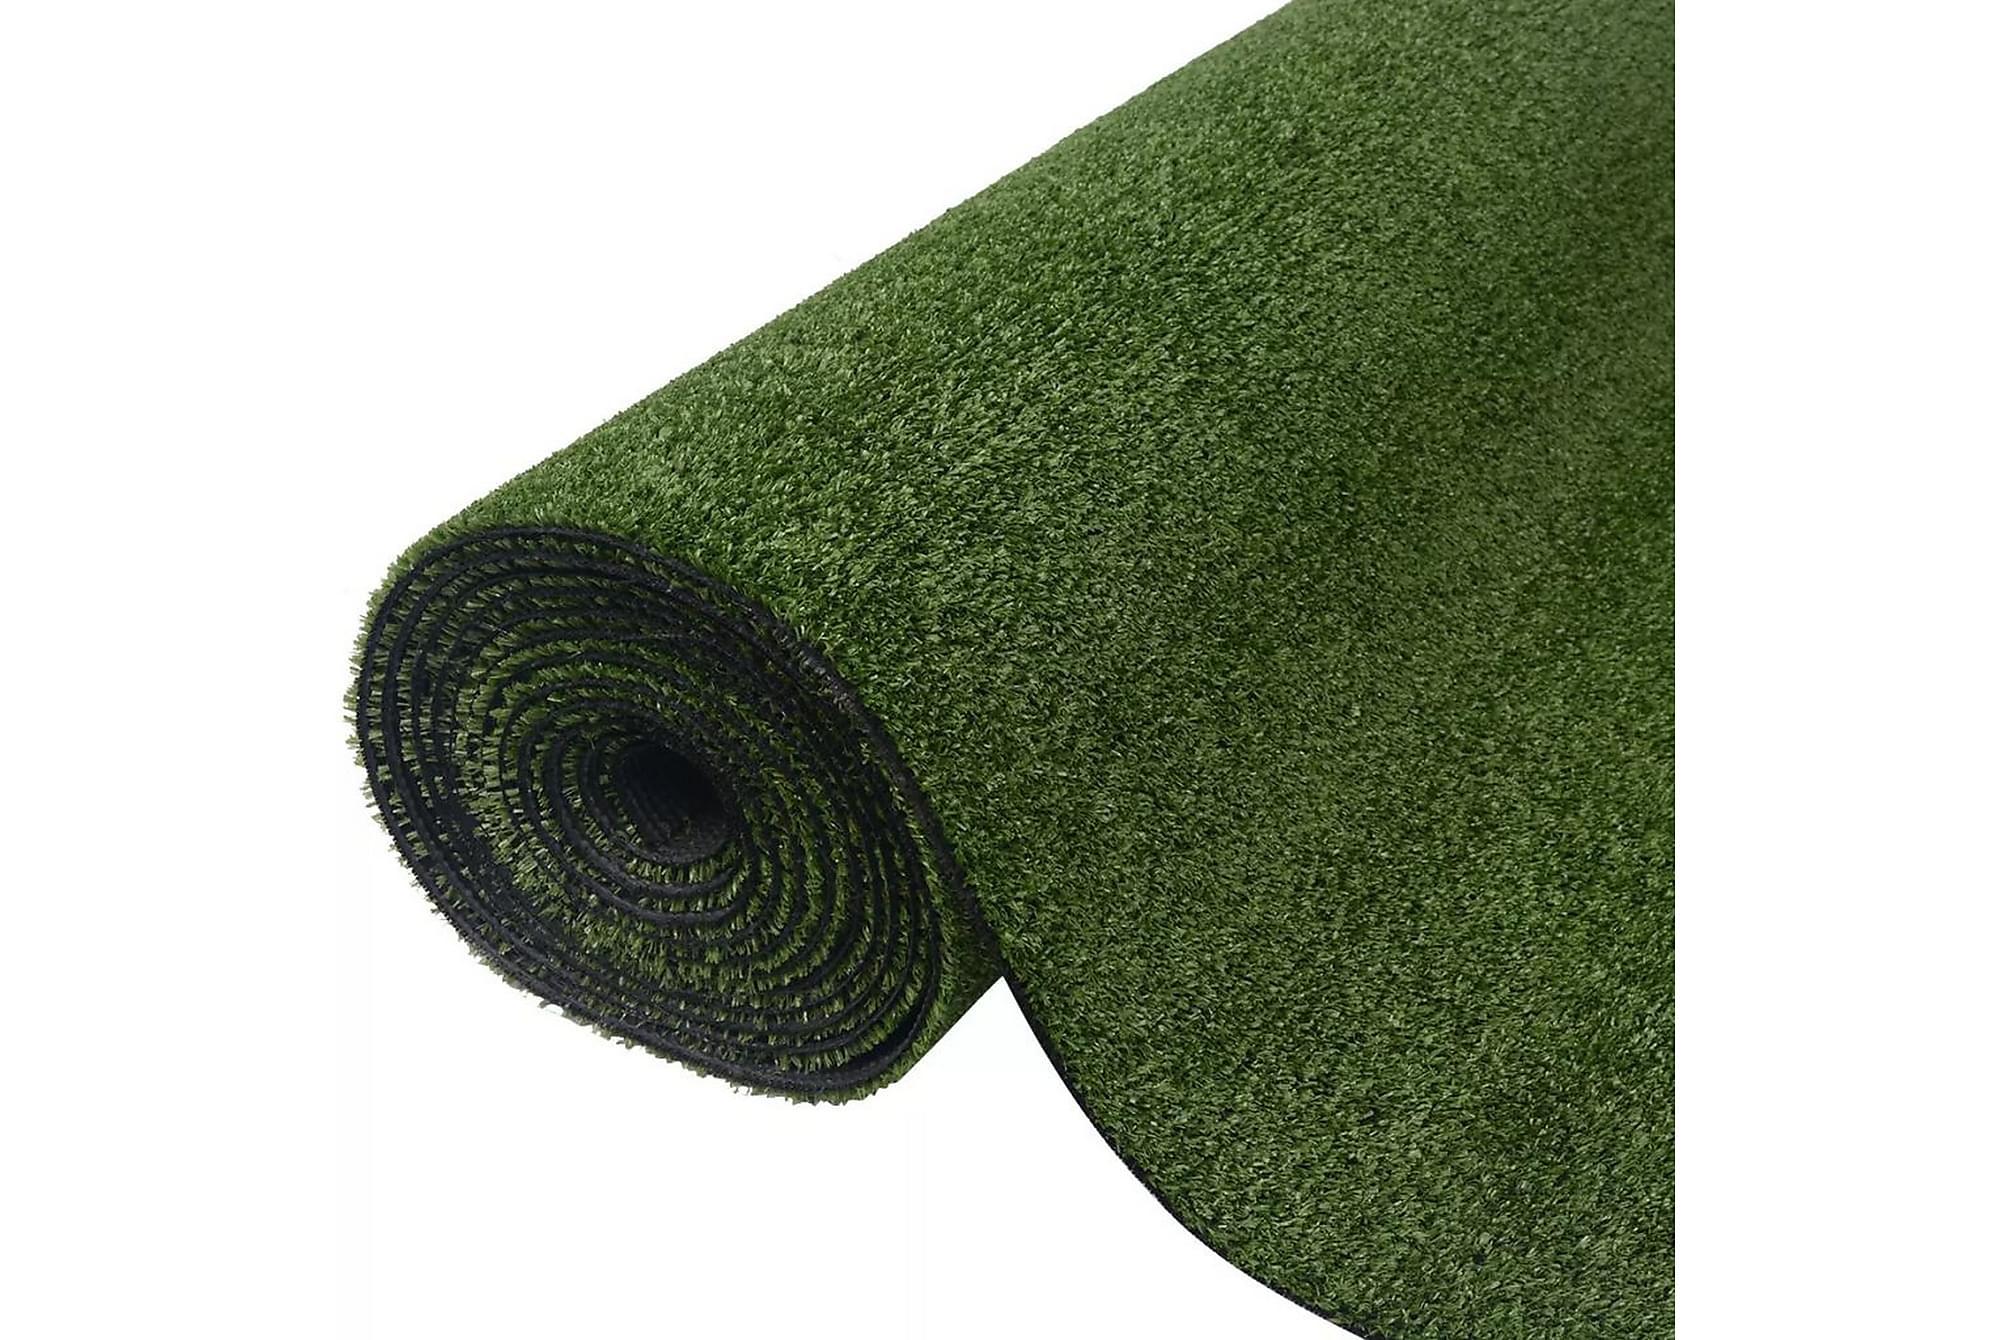 Konstgräsmatta 1×10 m/7-9 mm grön